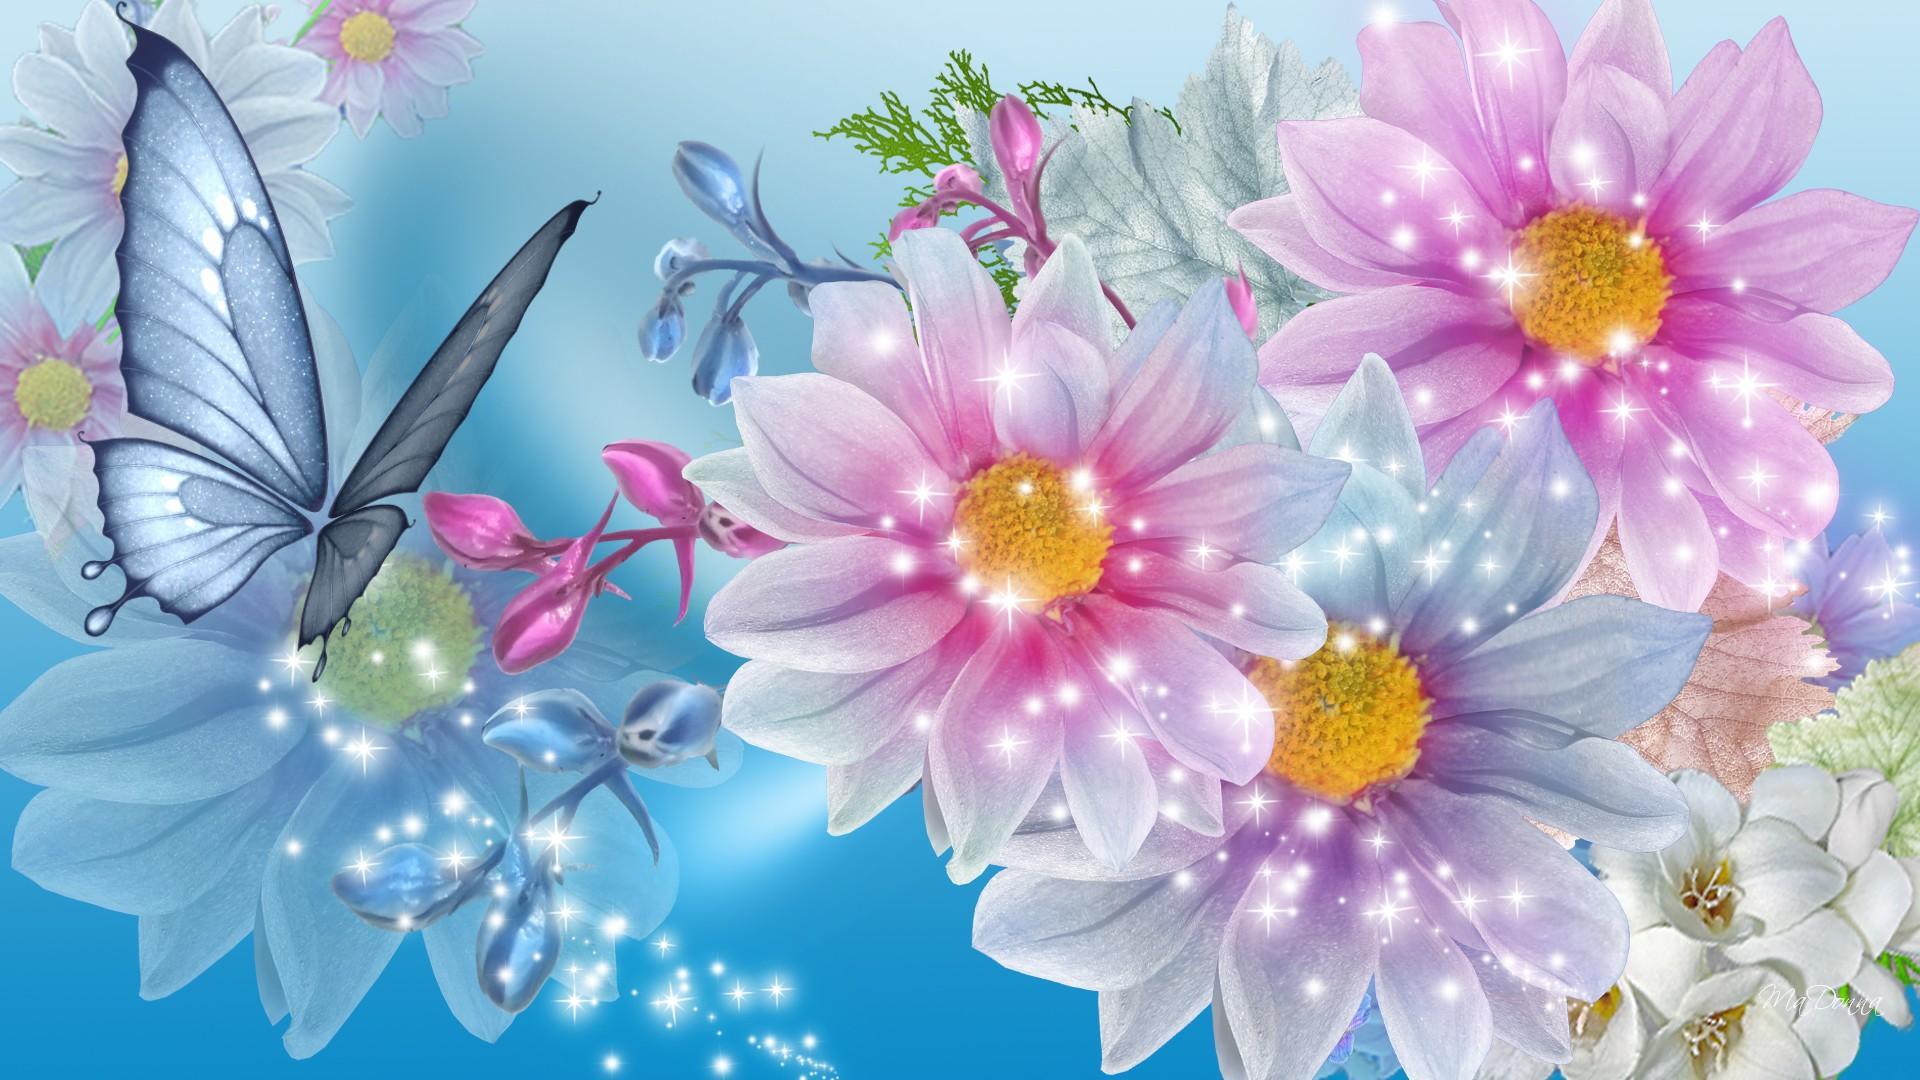 Funny Animated Wallpapers 粉蓝色碎花美女高清桌面壁纸:宽屏:高清晰度:全屏